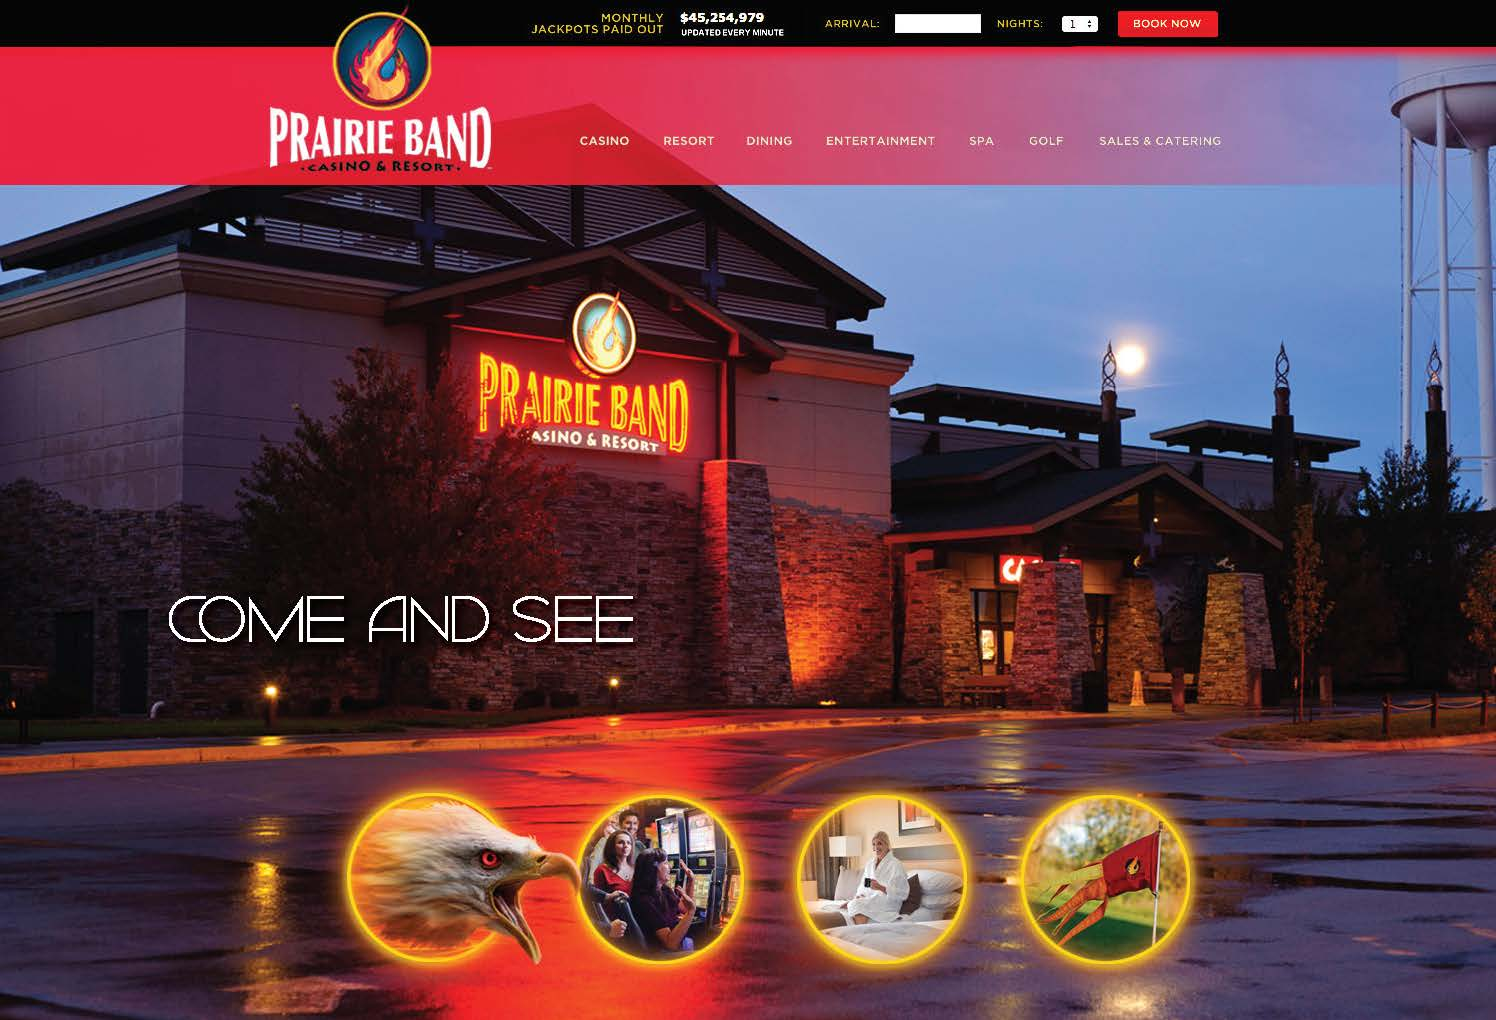 PrairieBandwww5.jpg